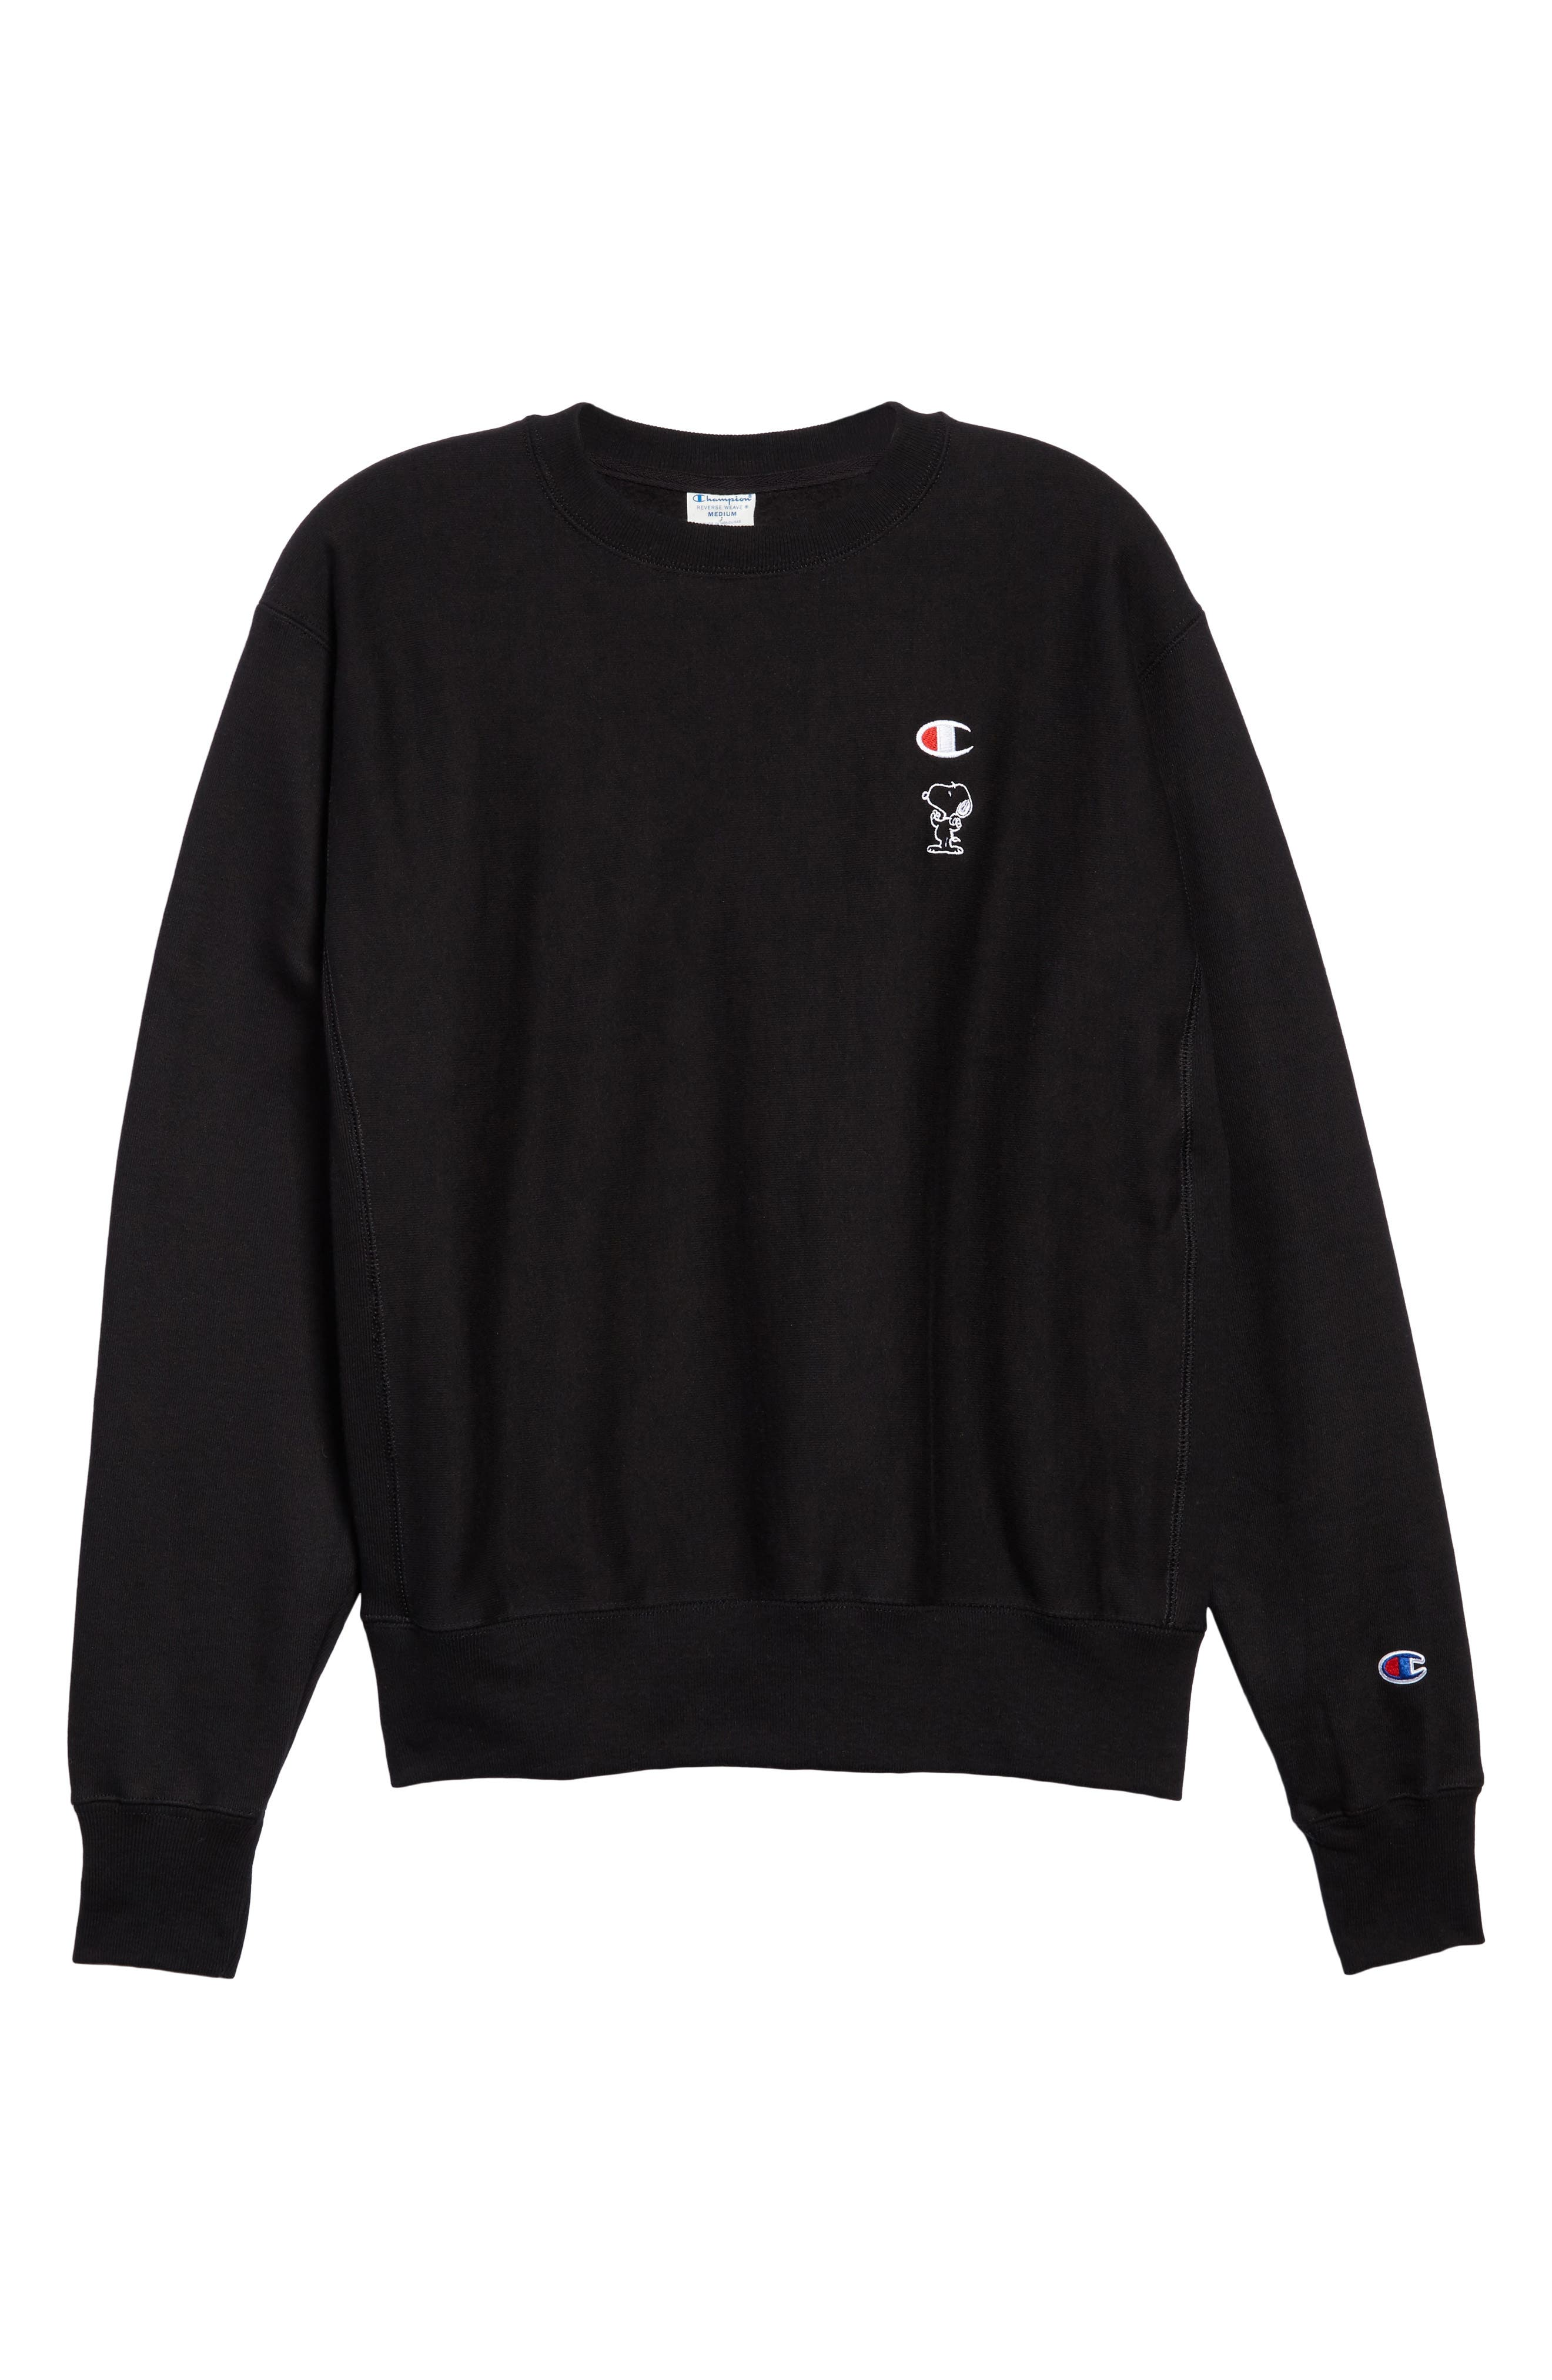 Snoopy Unisex Sweatshirt,                             Alternate thumbnail 6, color,                             001